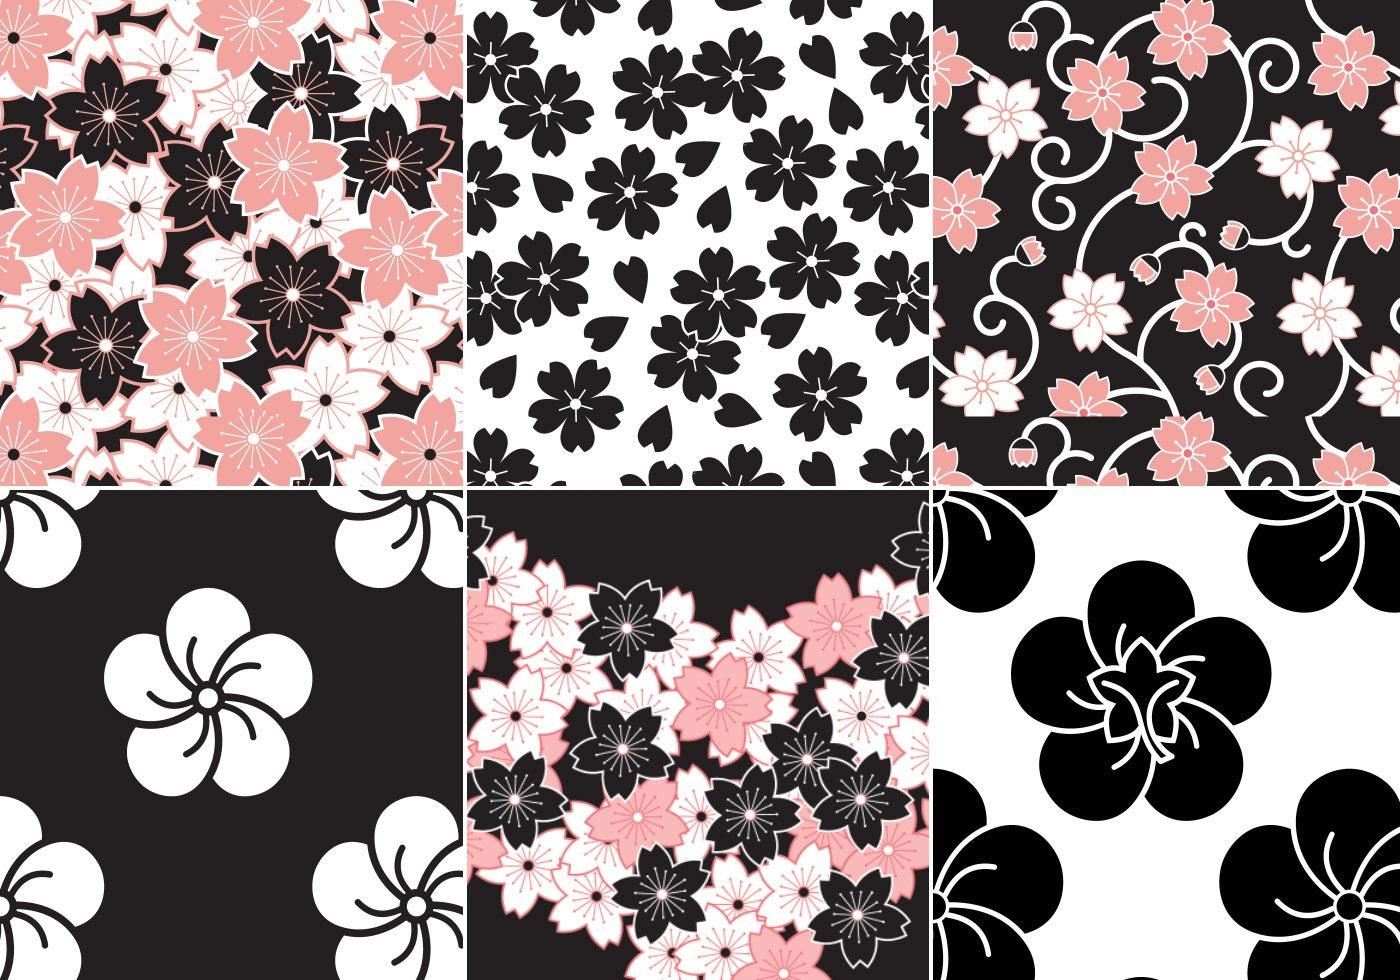 sakura flower vector pattern pack download free vector